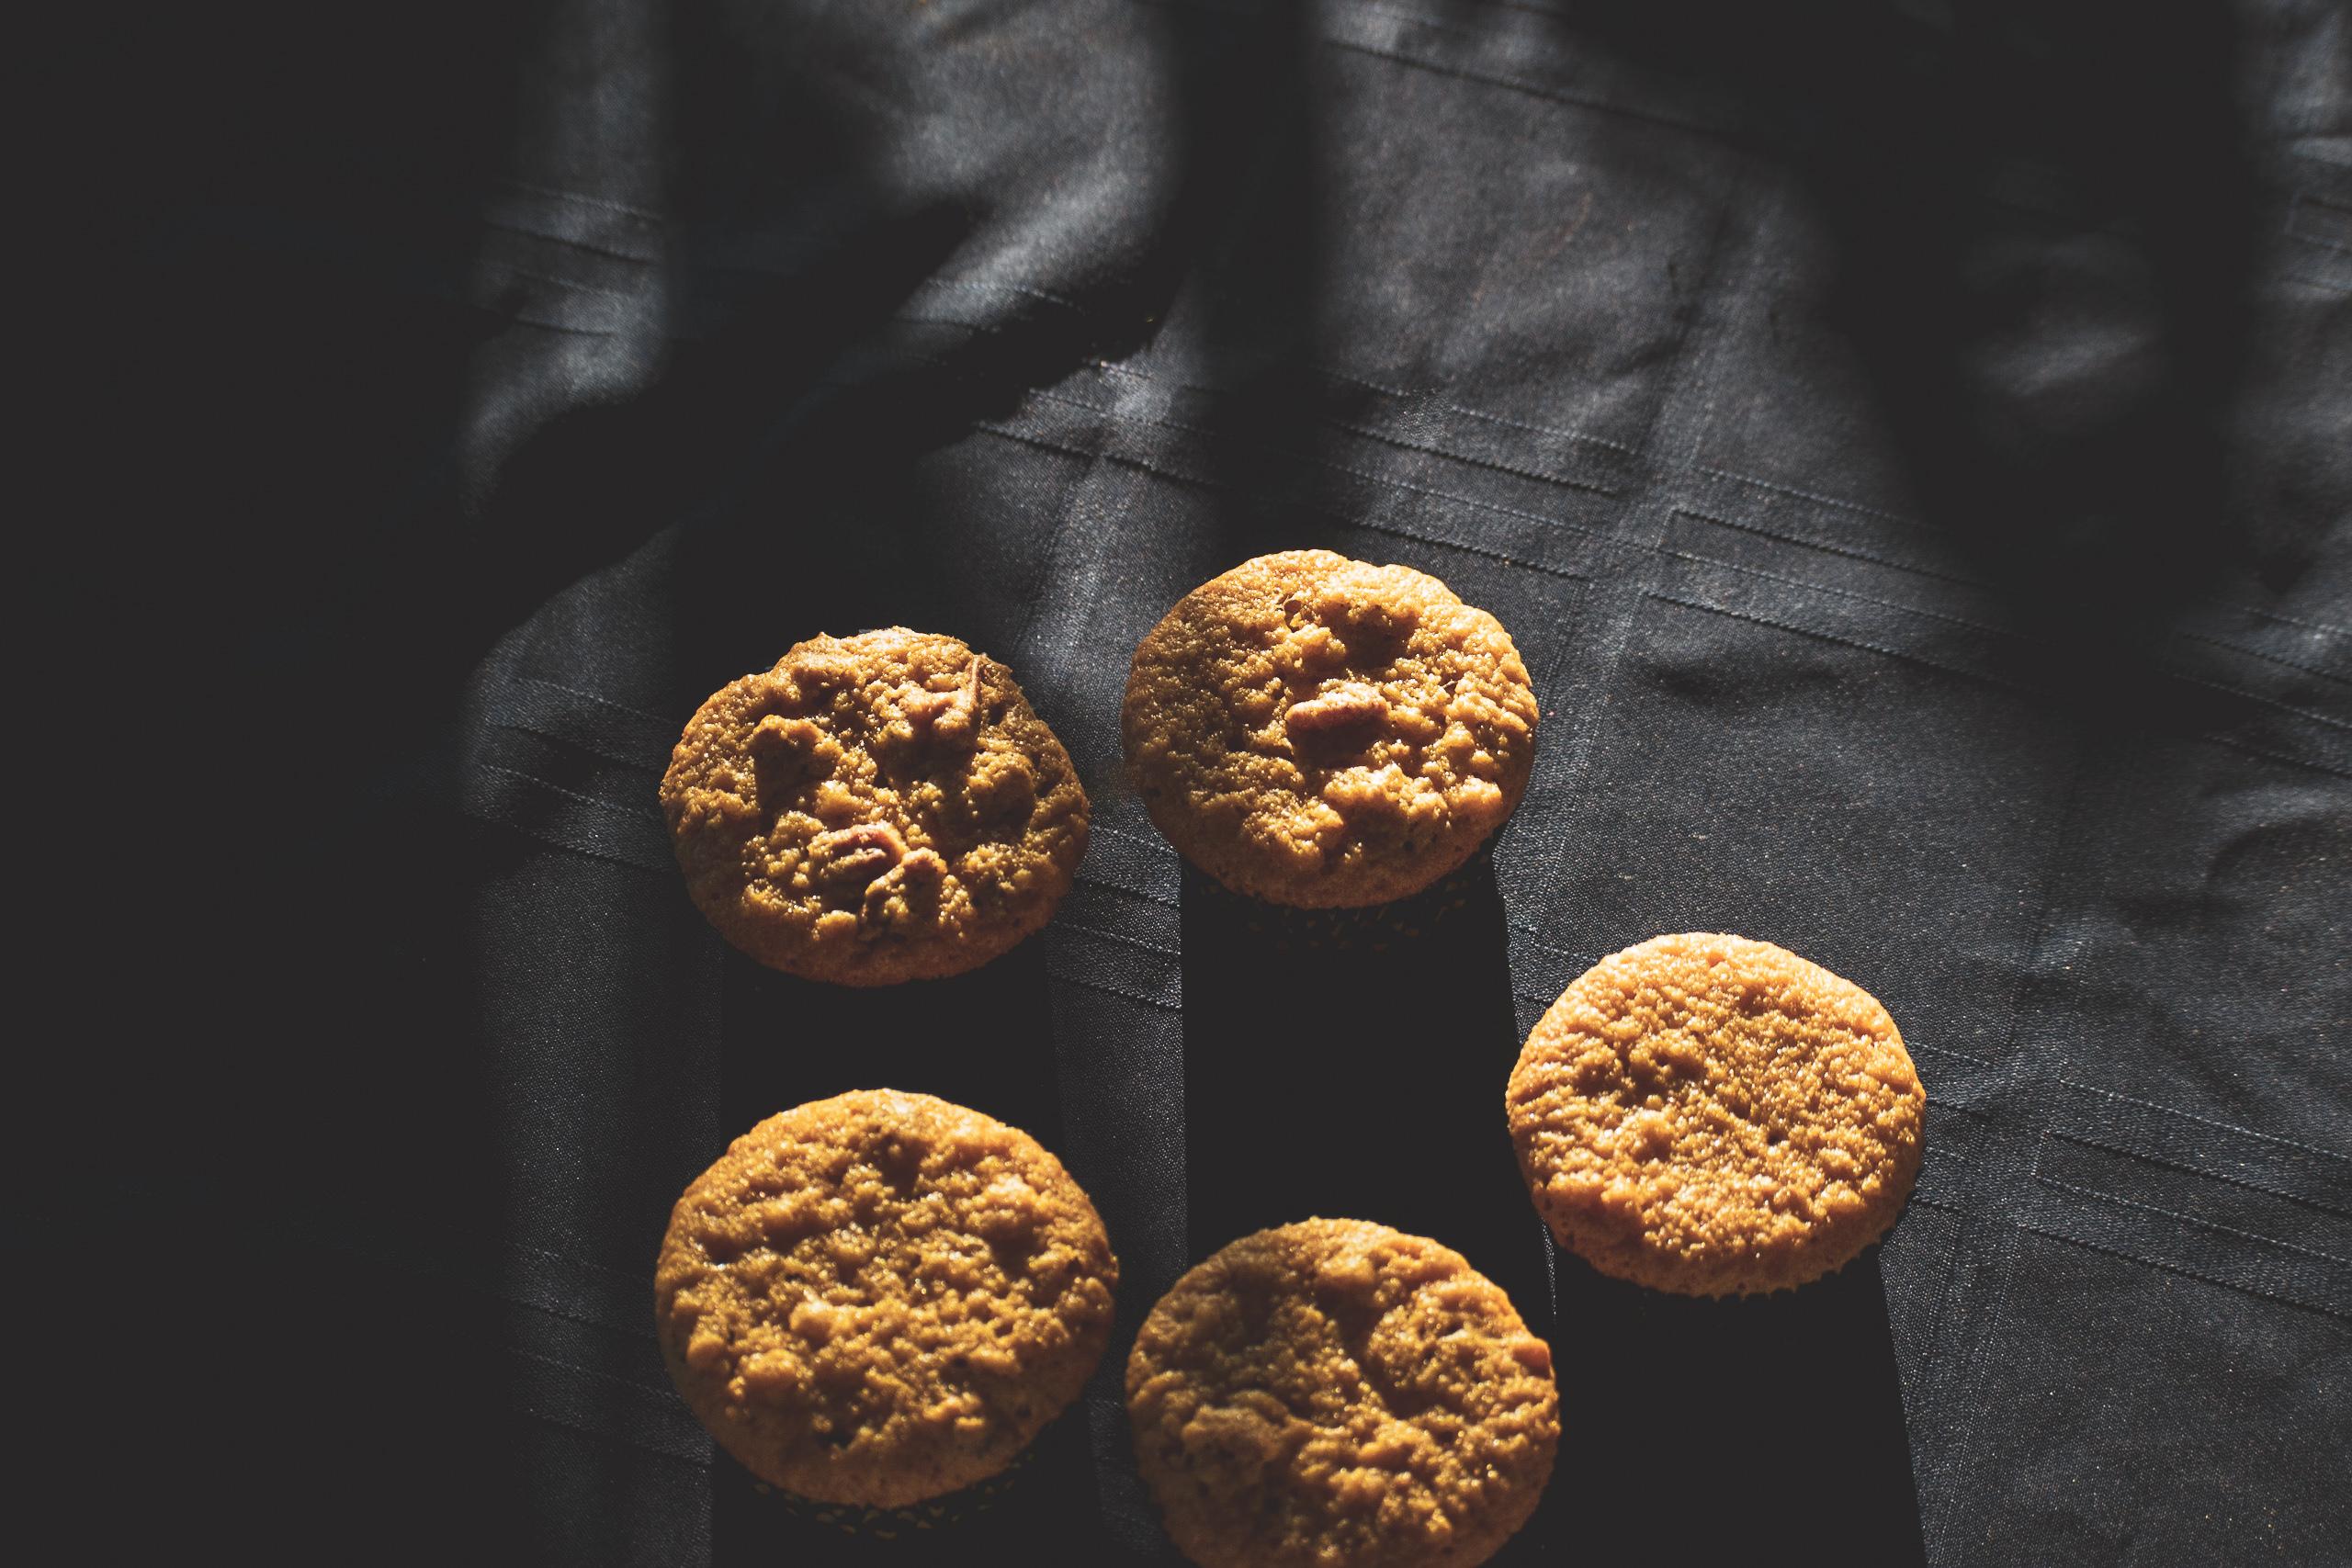 Christopher's Bakery | Dessert | Baked Good | Muffin | Gluten-Free Vanilla Wafer